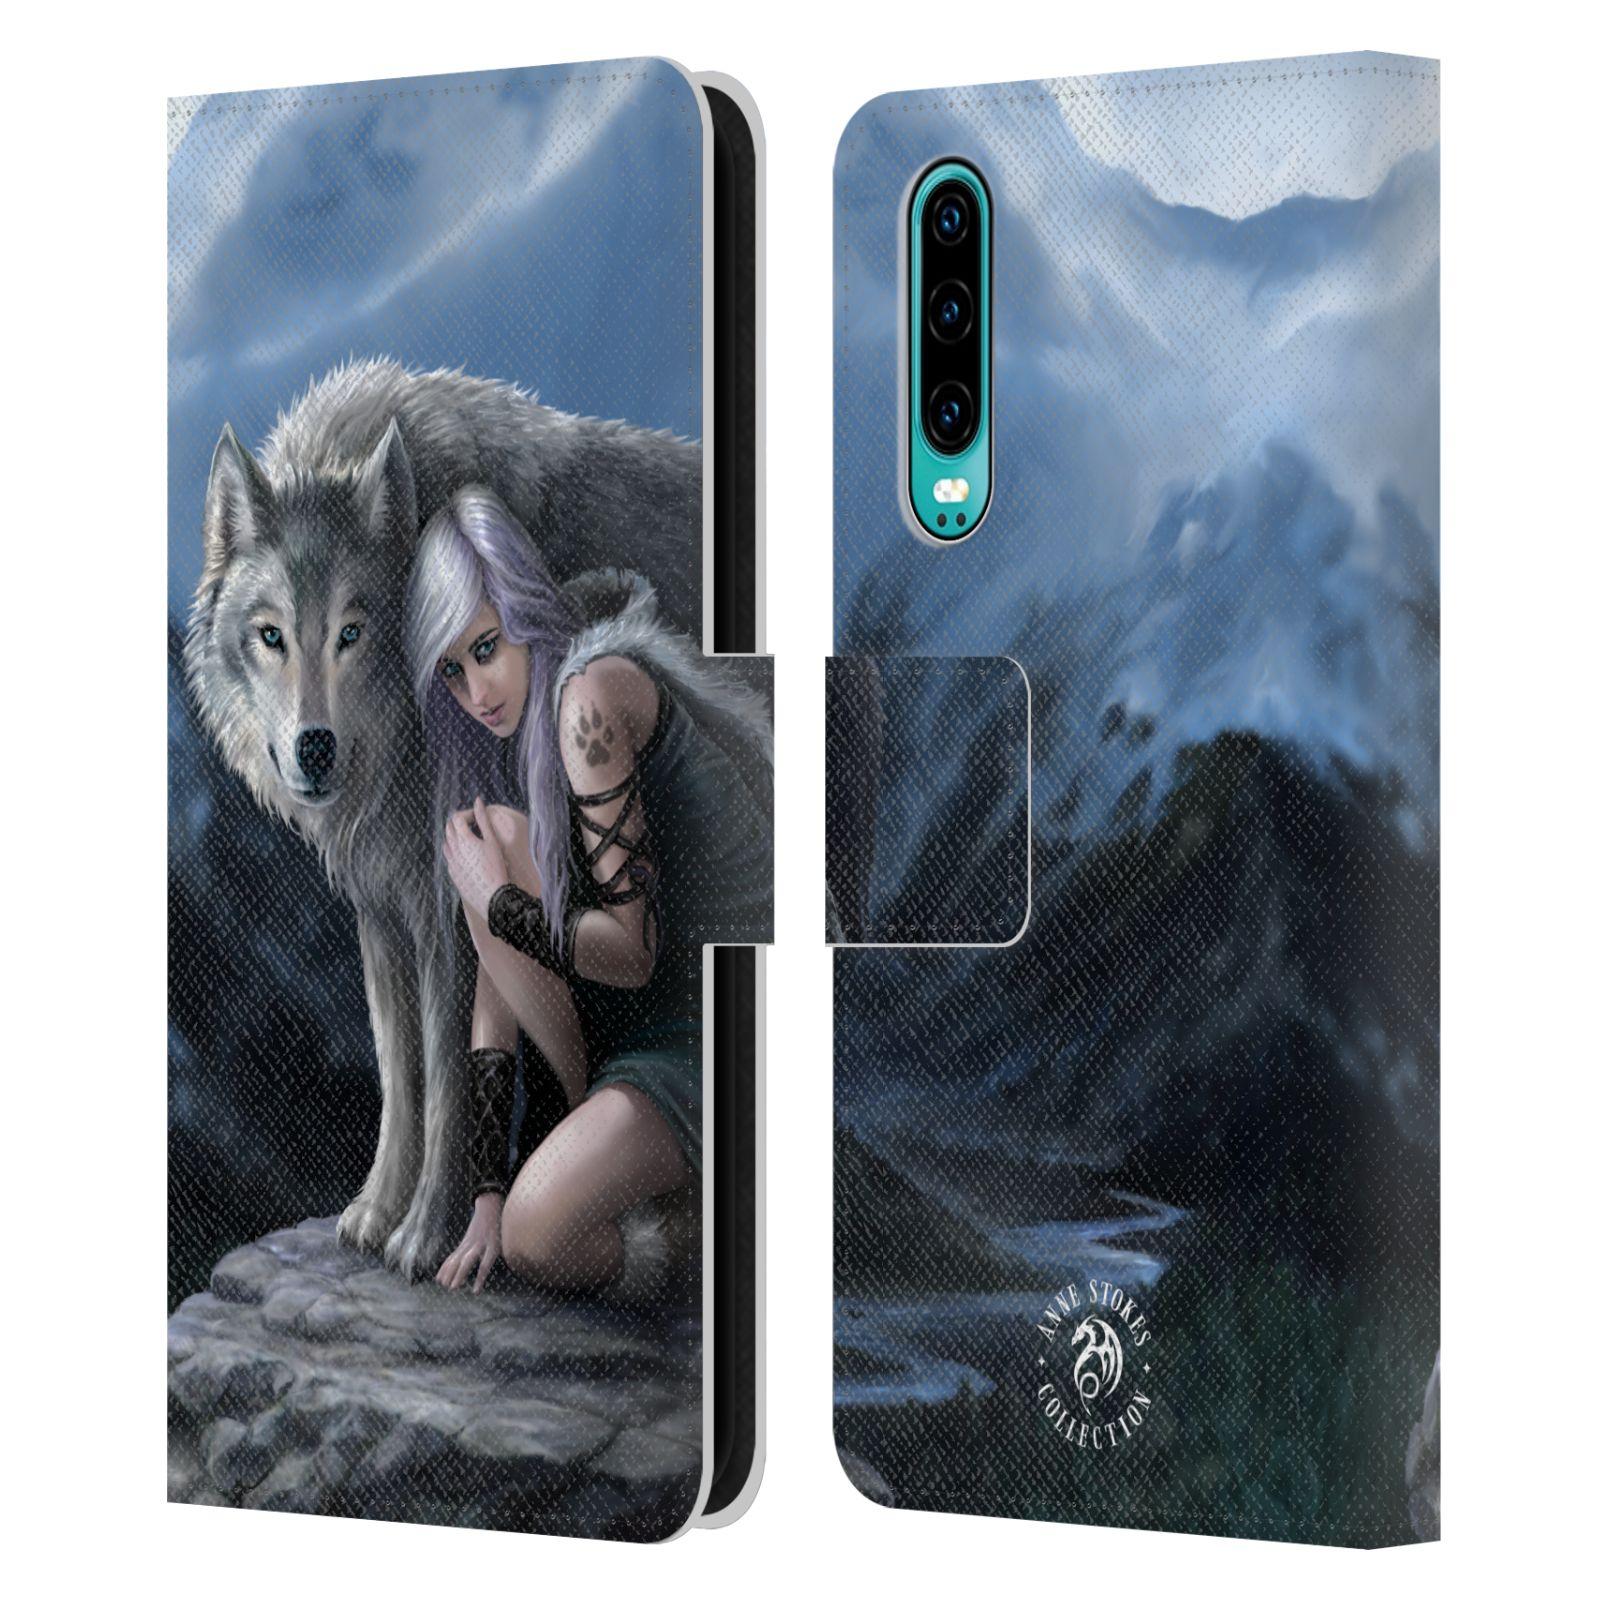 Pouzdro na mobil Huawei P30 - Head Case - fantasy - vlk ochránce